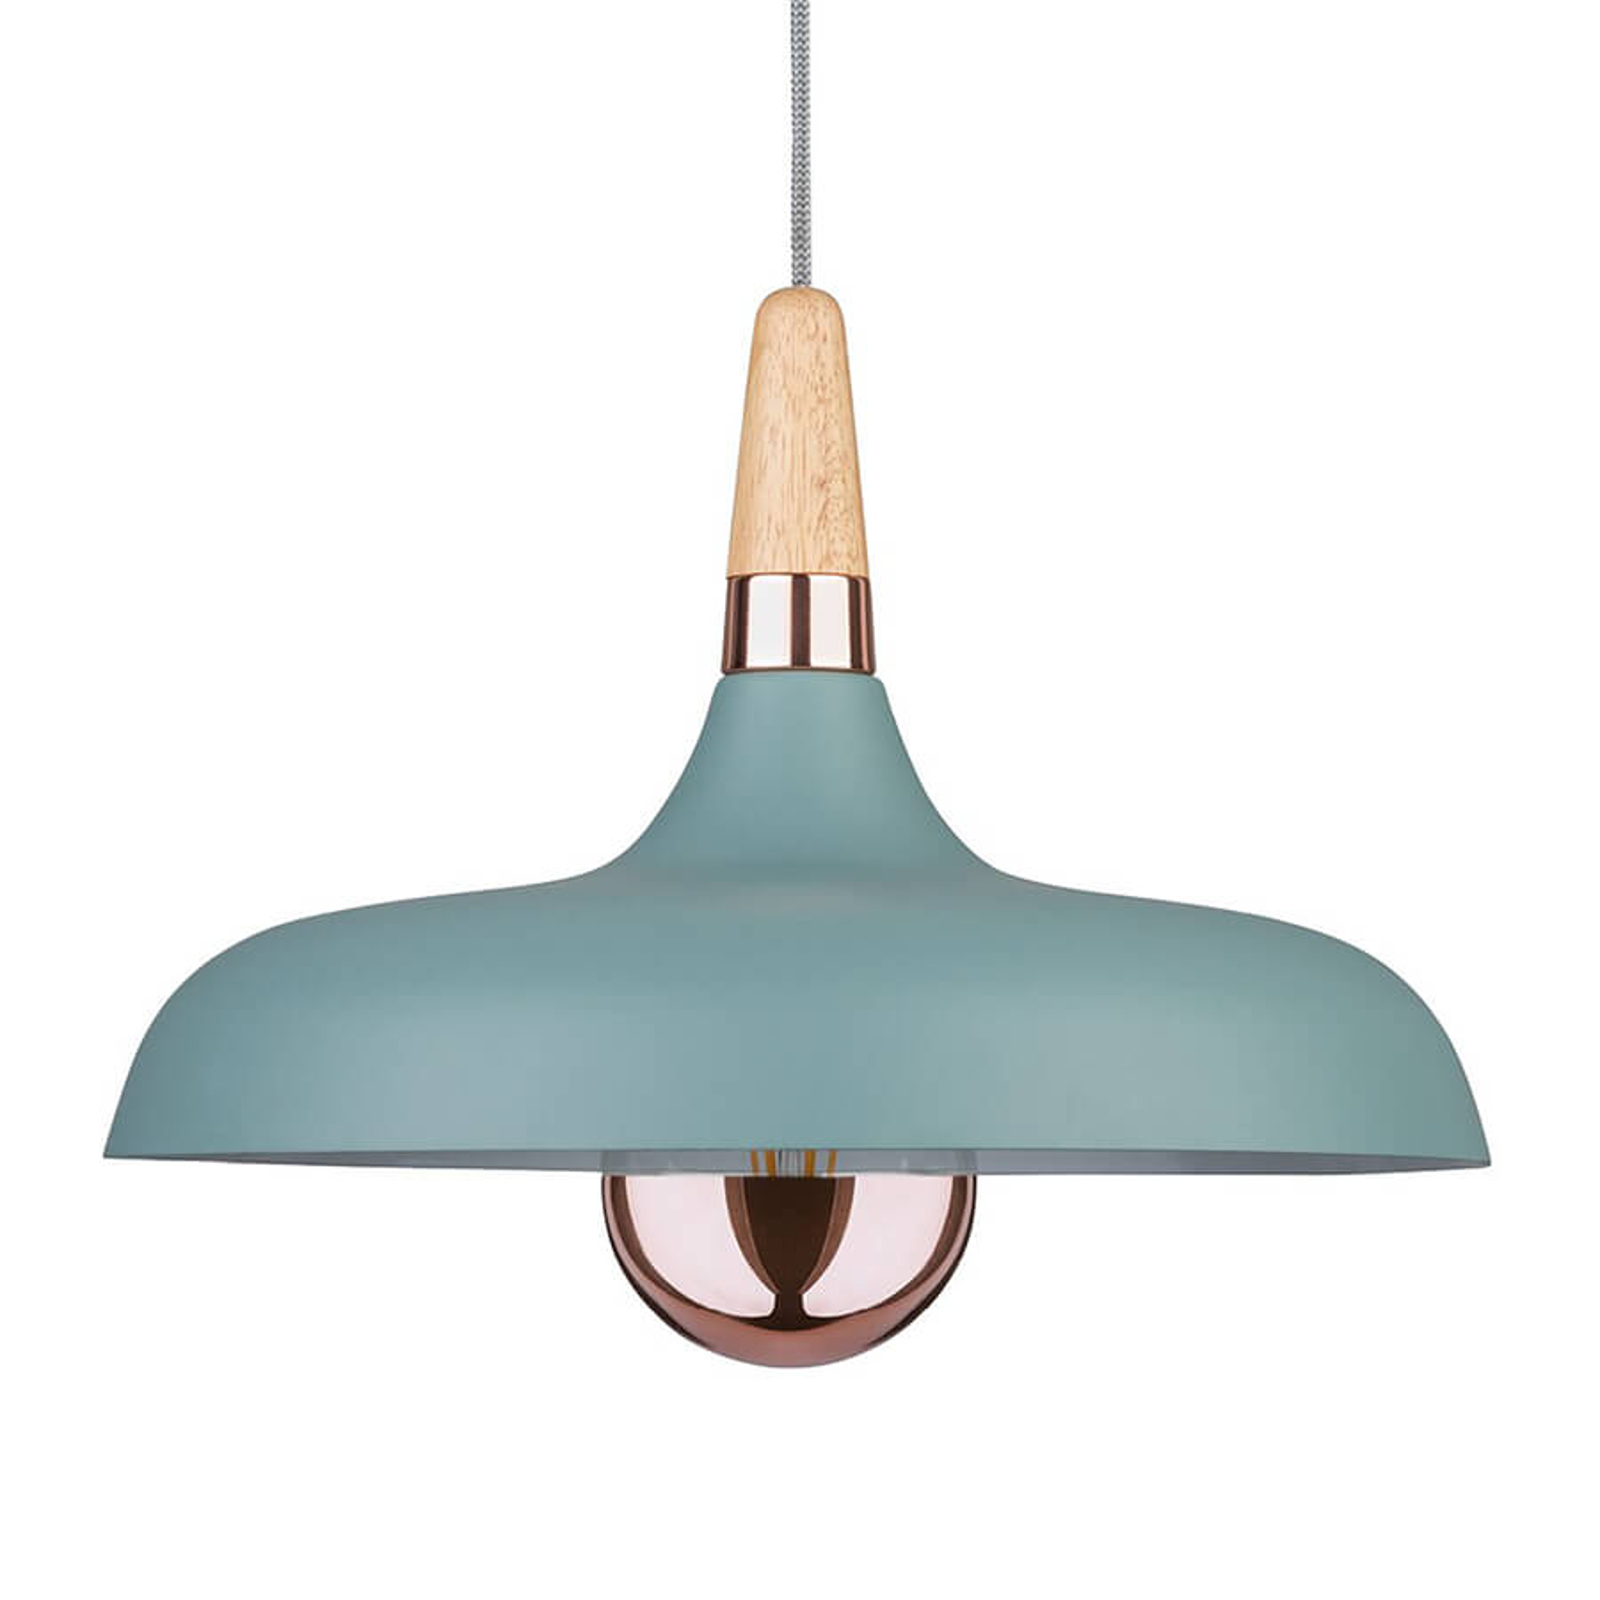 Paulmann Juna lámpara colgante, 1 luz, Ø 34,2 cm